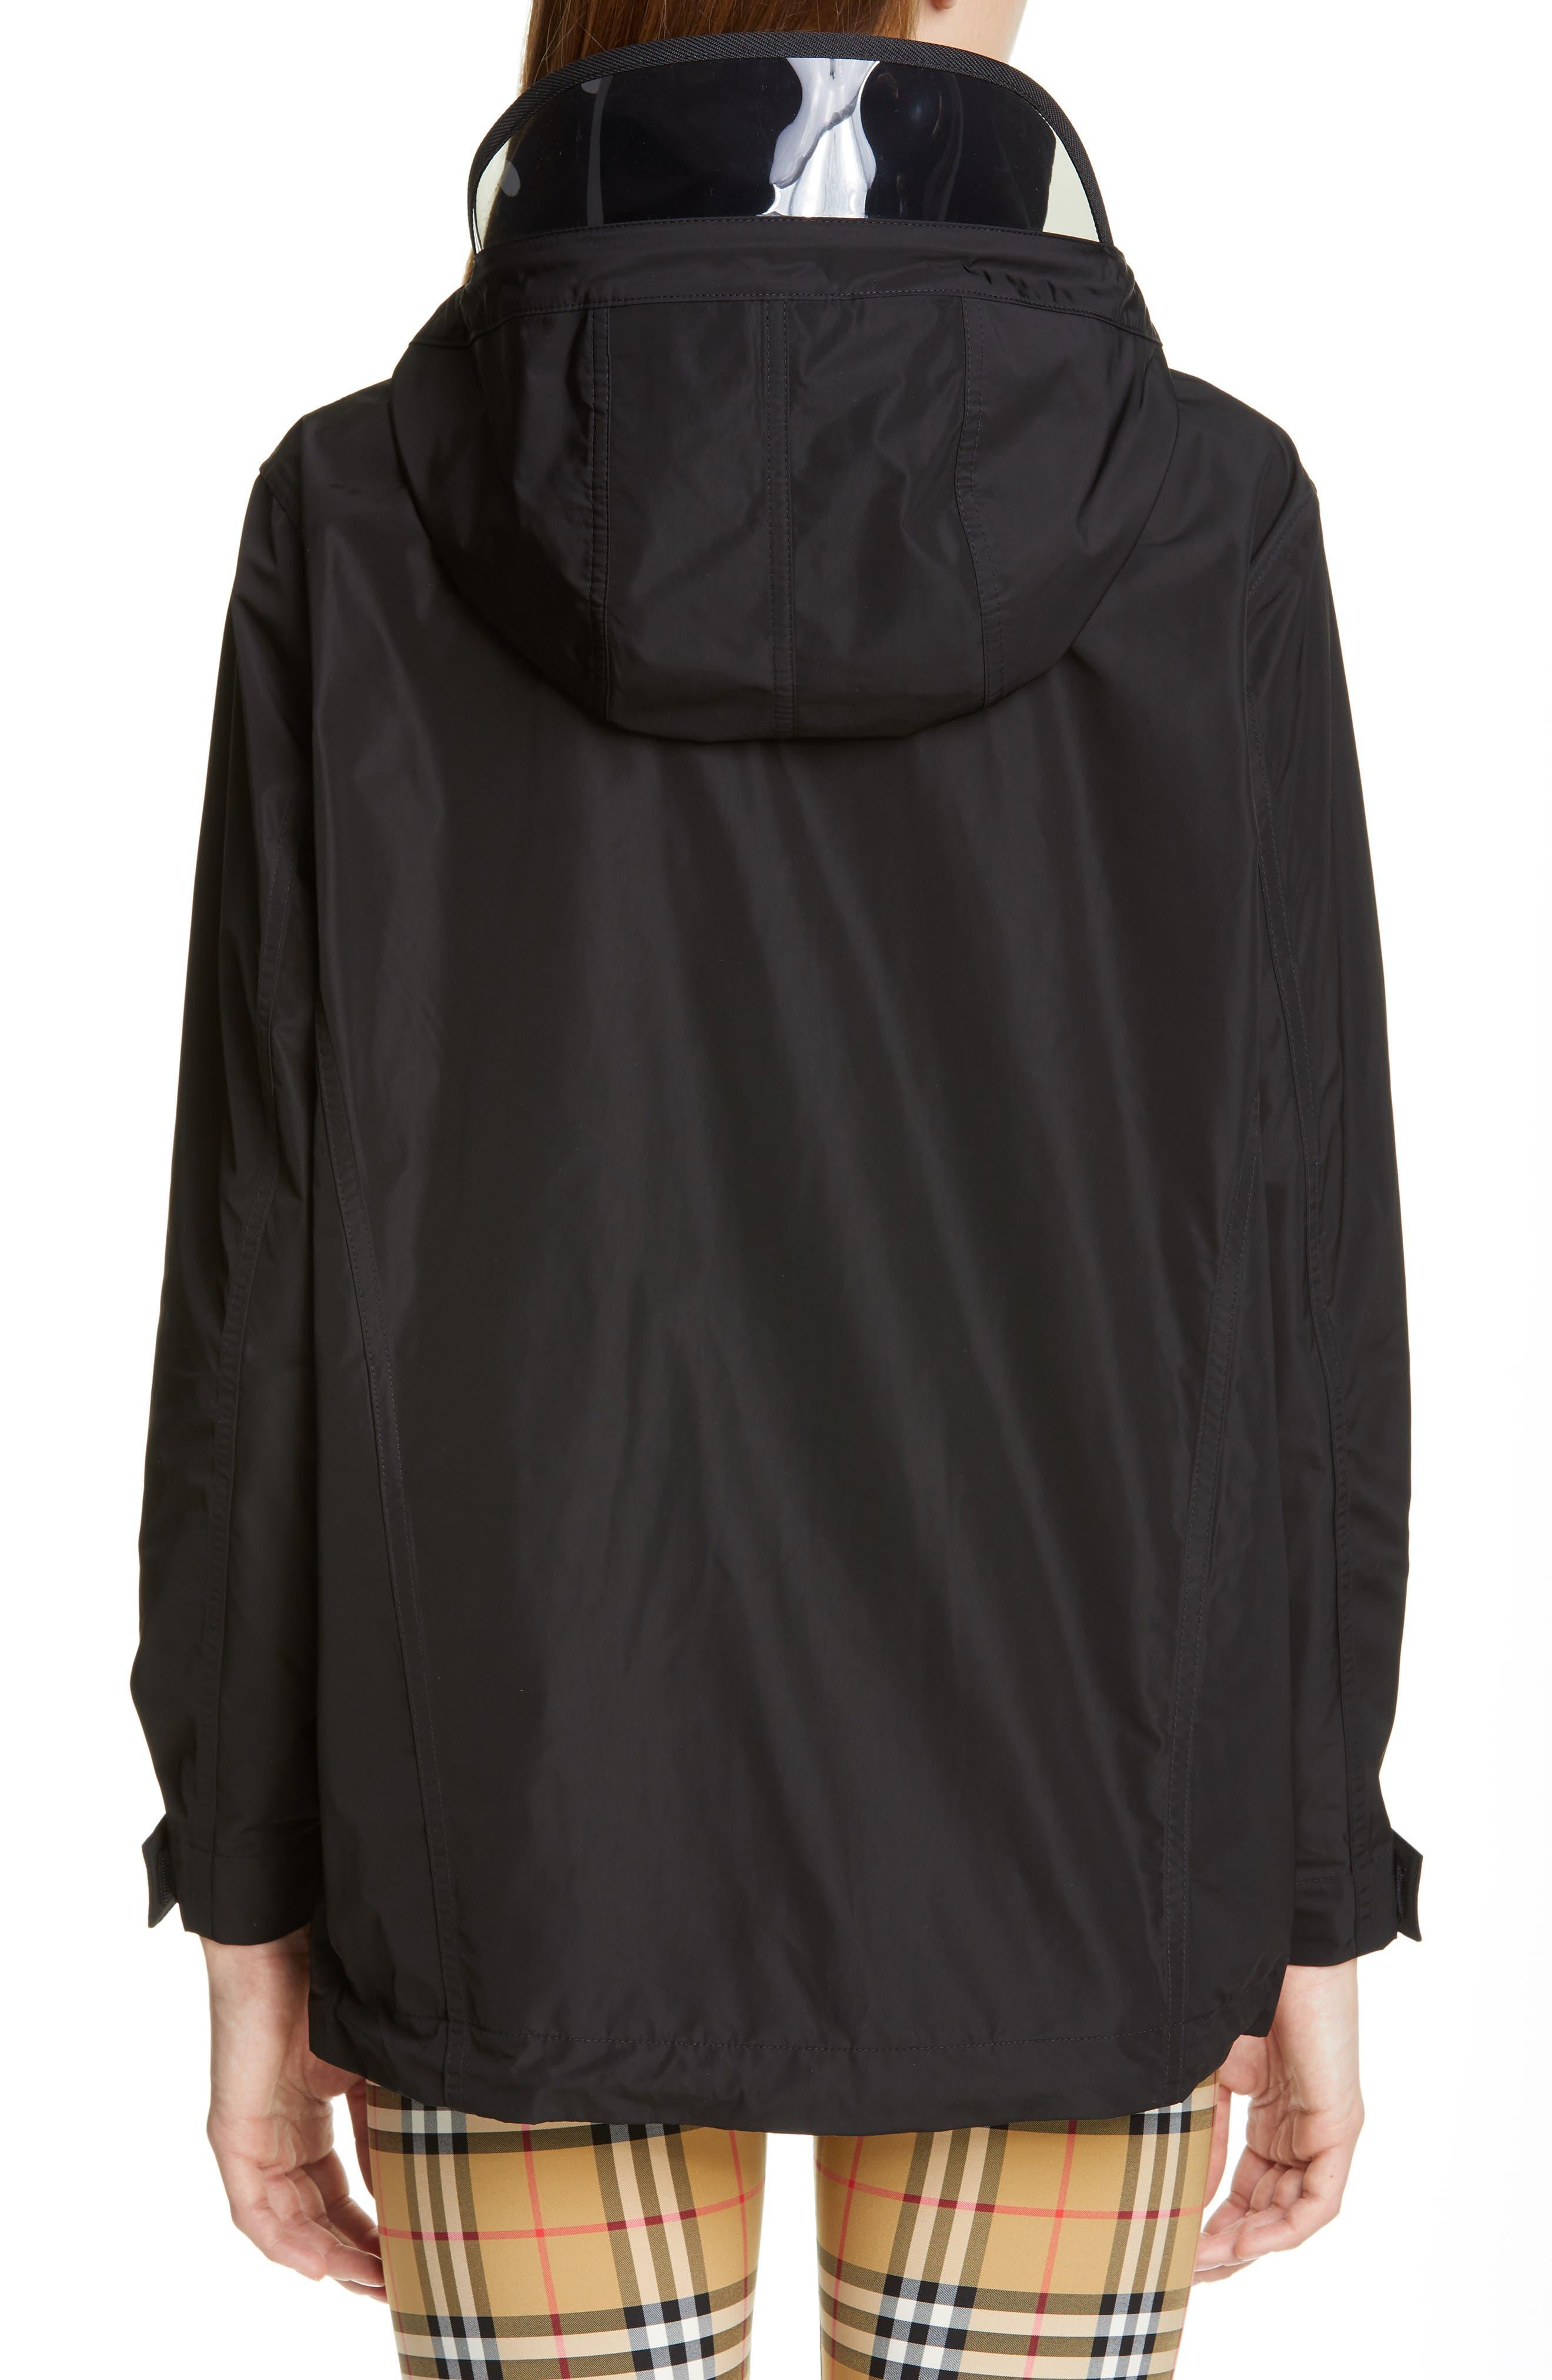 BURBERRY, Kway Millport Logo Print Waterproof Taffeta Jacket, Alternate thumbnail 3, color, BLACK